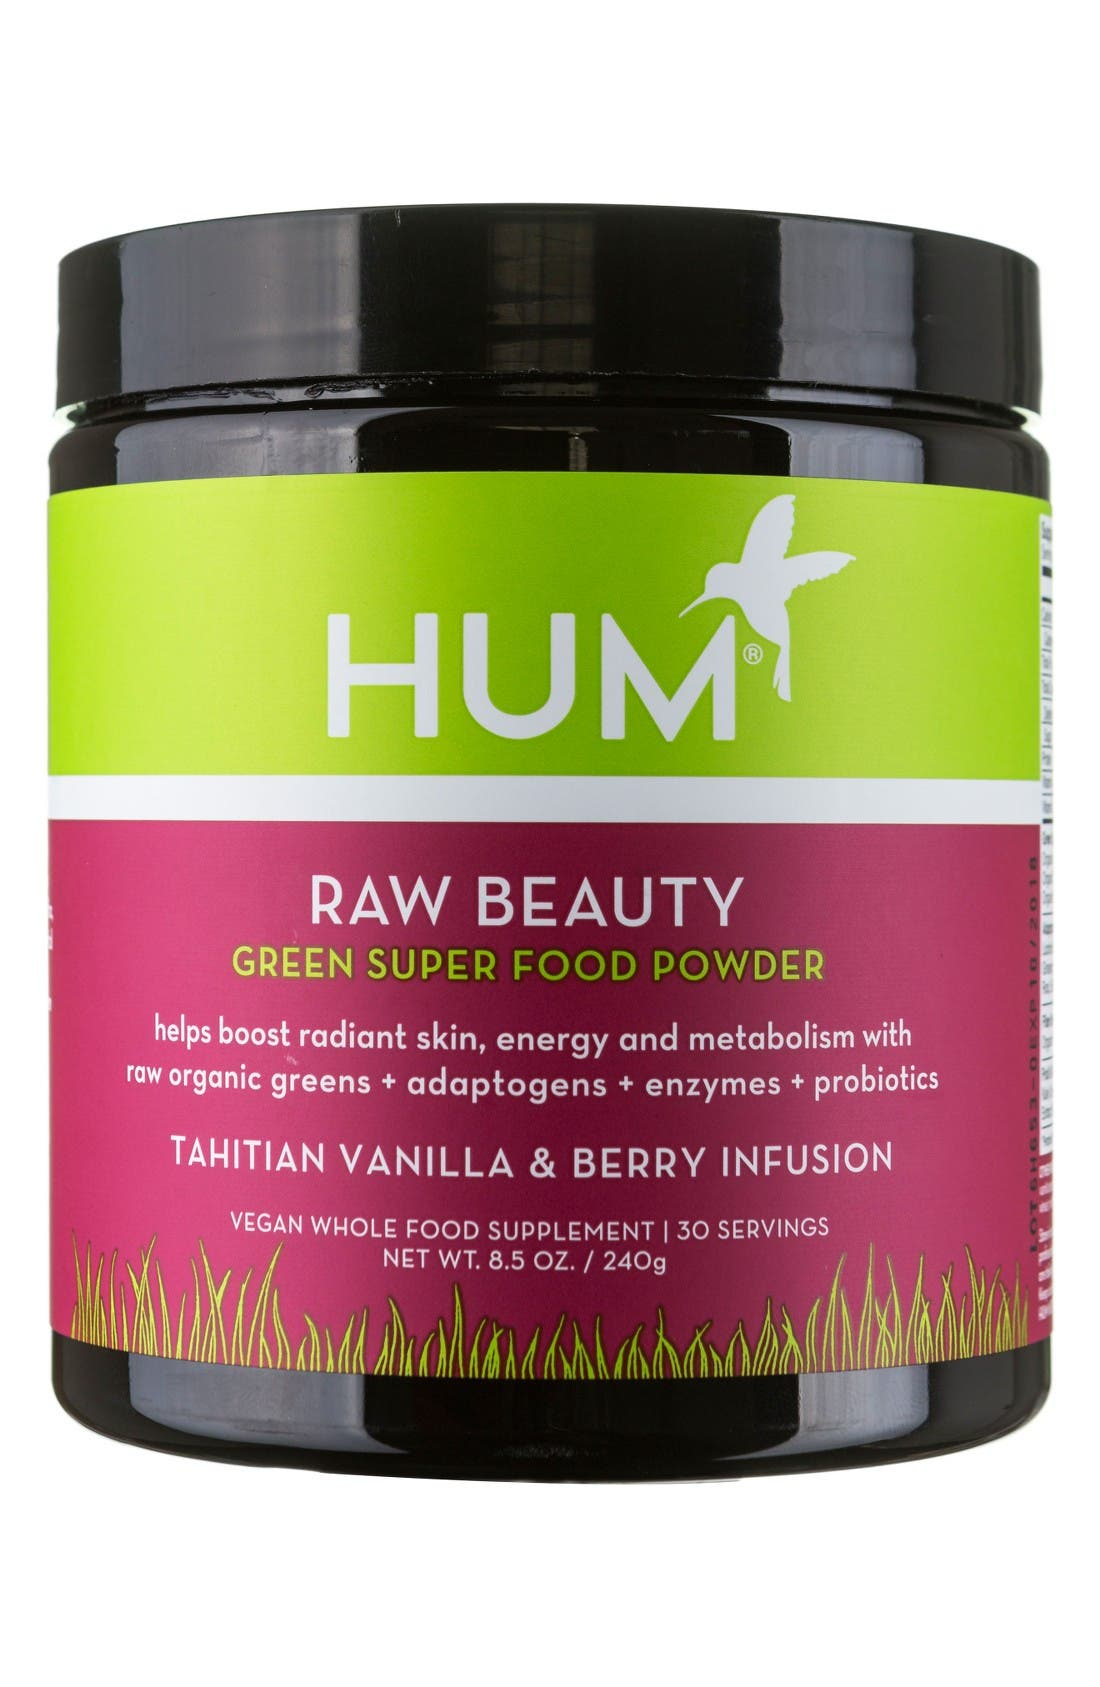 Hum Nutrition Raw Beauty Tahitian Vanilla & Berry Infusion Skin & Energy Green Superfood Powder